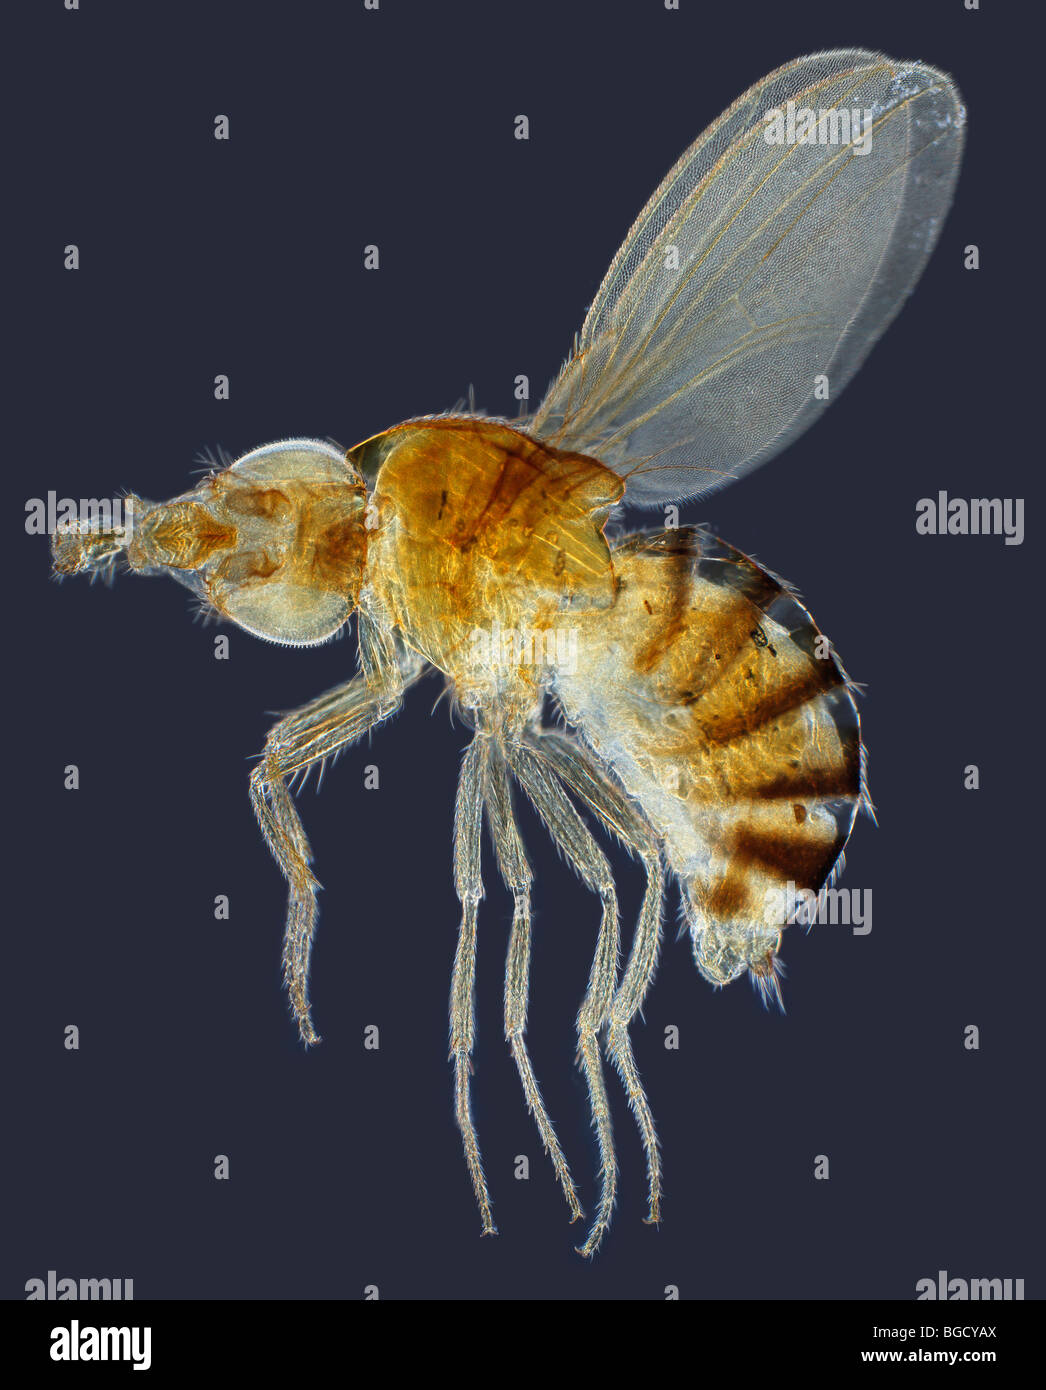 Drosophila funebris (Fruit or Vinegar Fly) darkfield photomicrograph Stock Photo